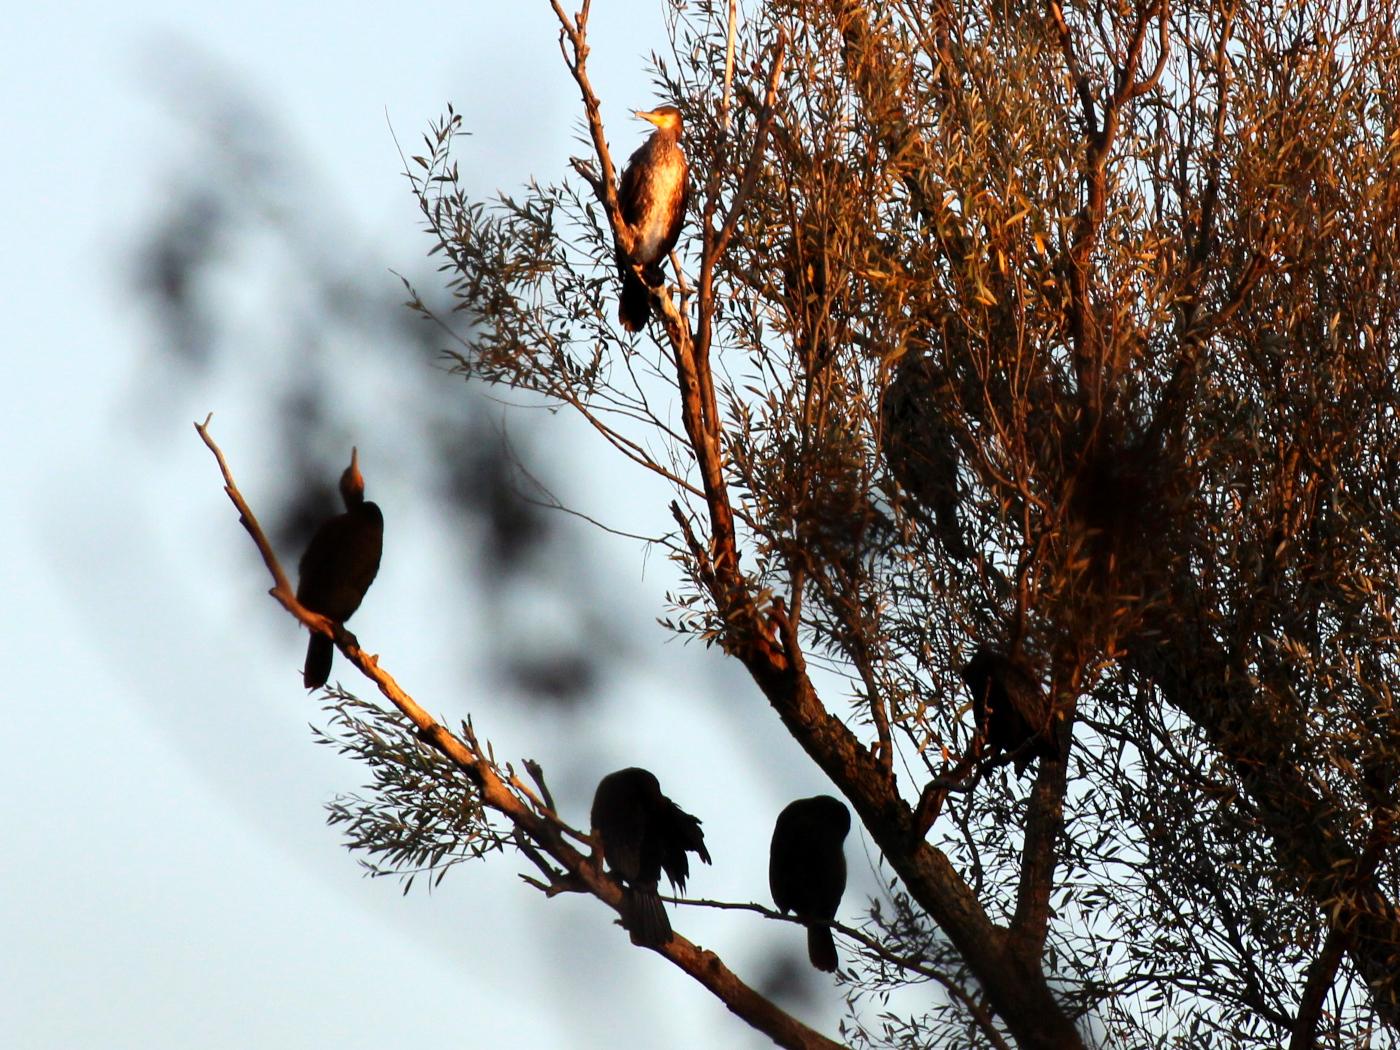 Baum mit Kormoranen